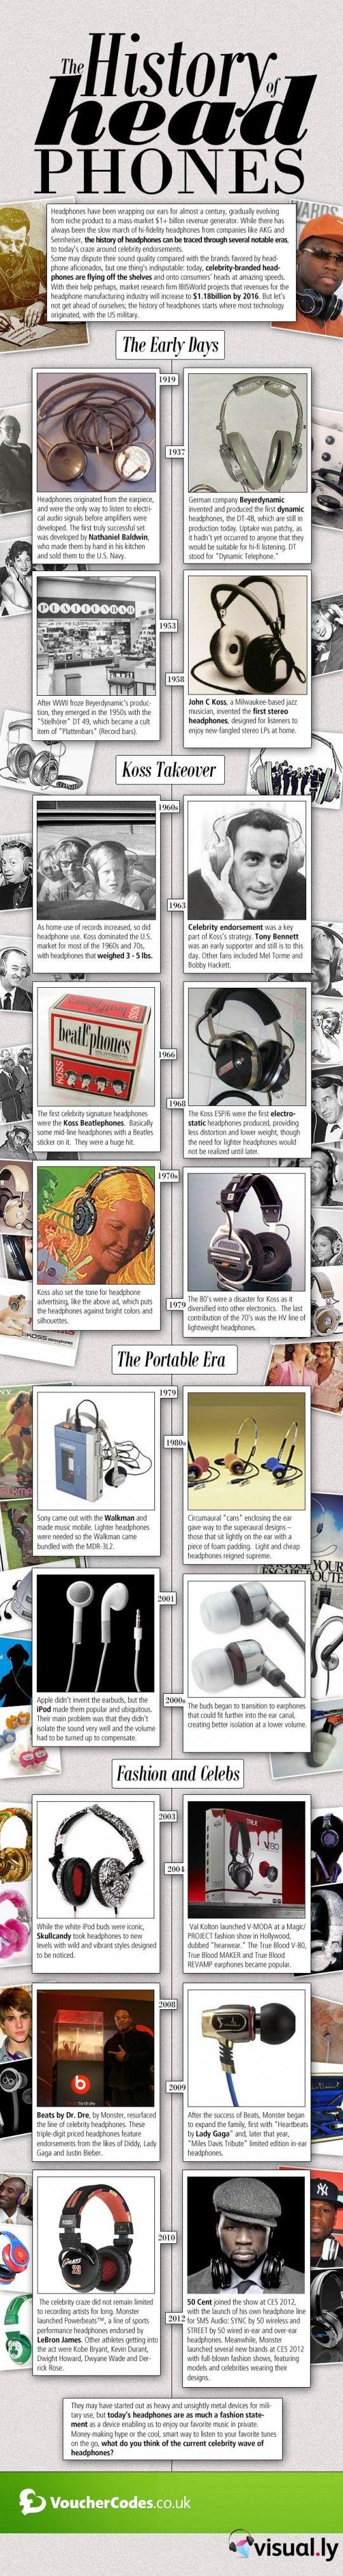 fun infographic - the history of headphones